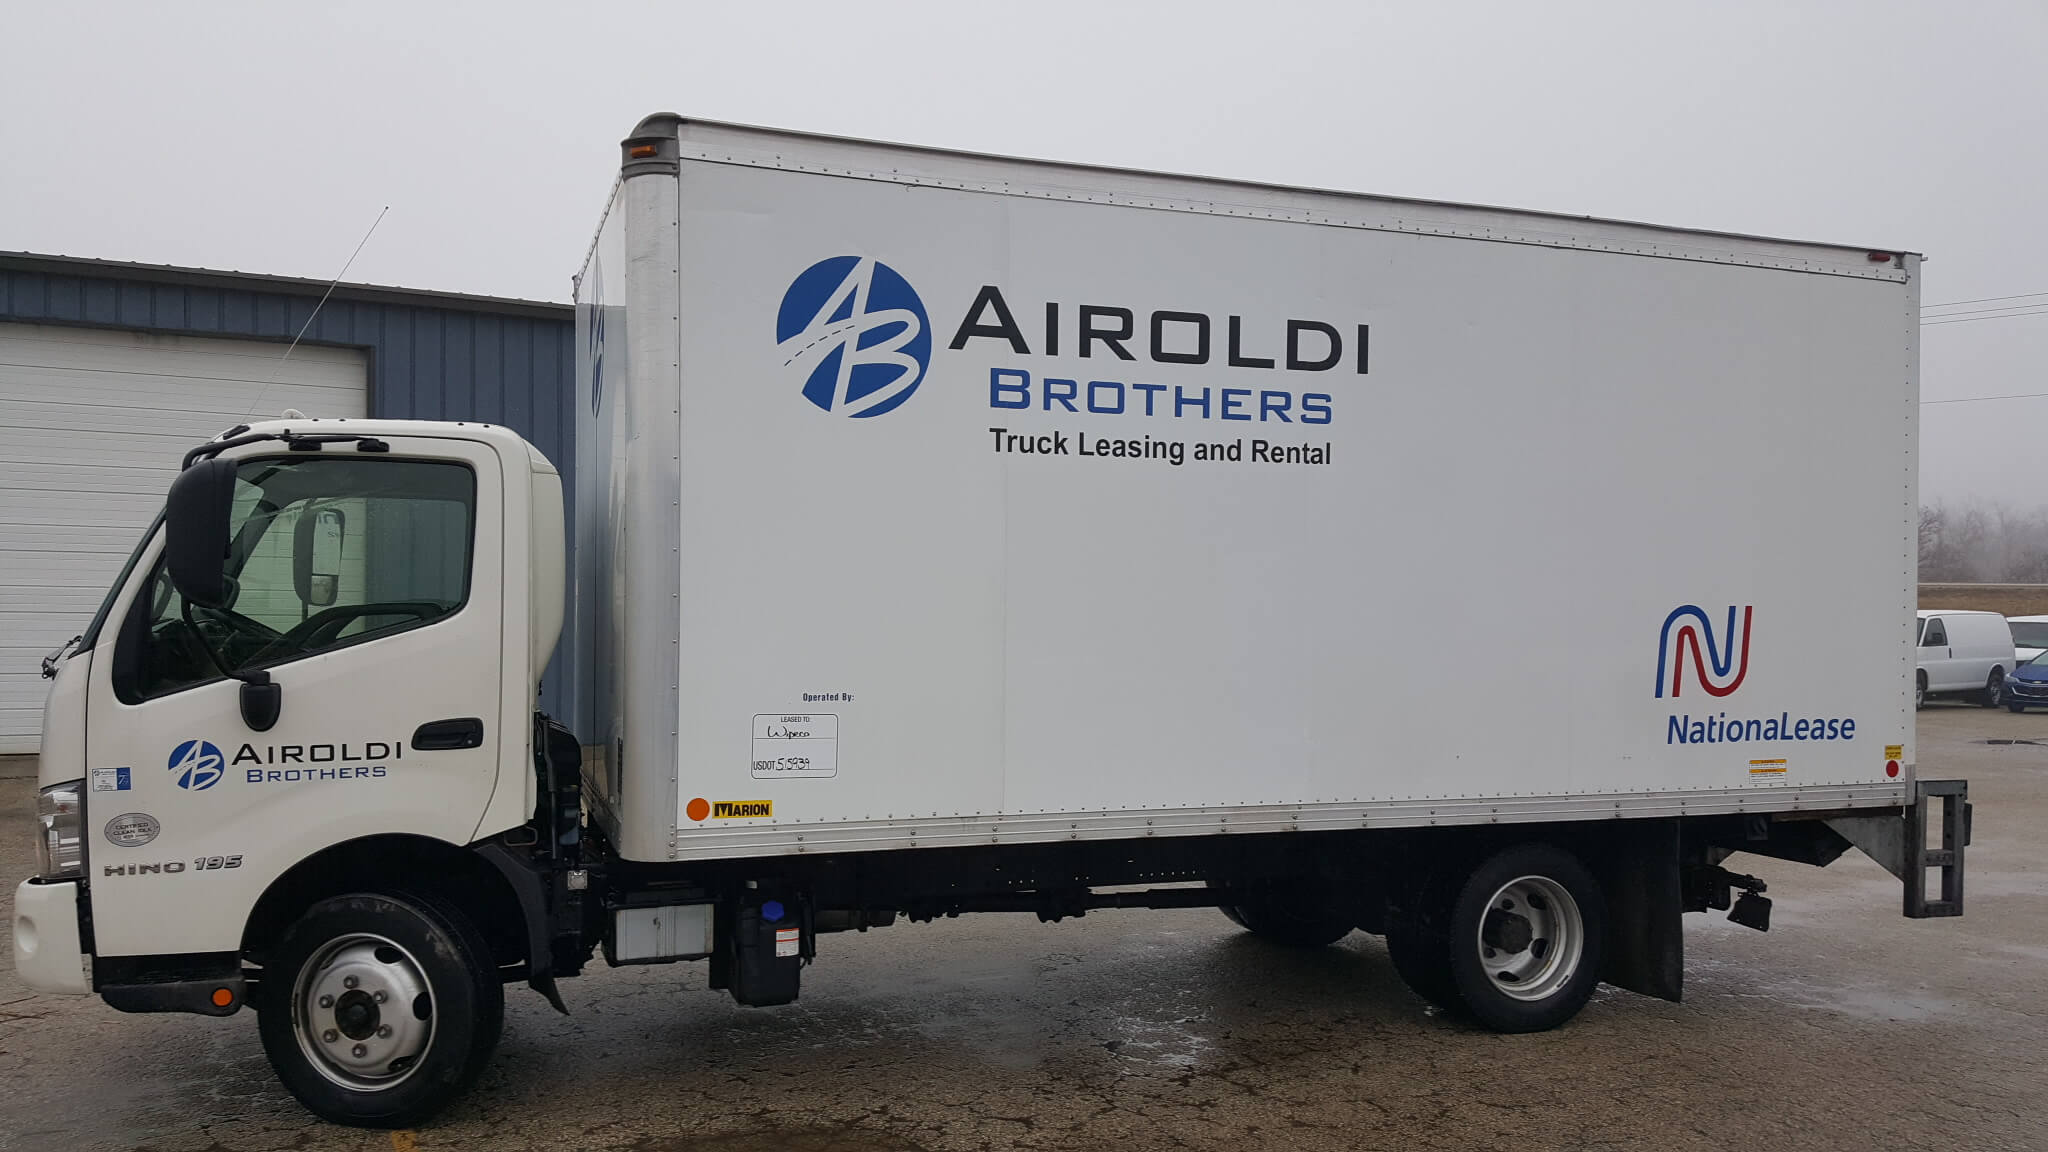 Box truck fleet graphics for Airoldi